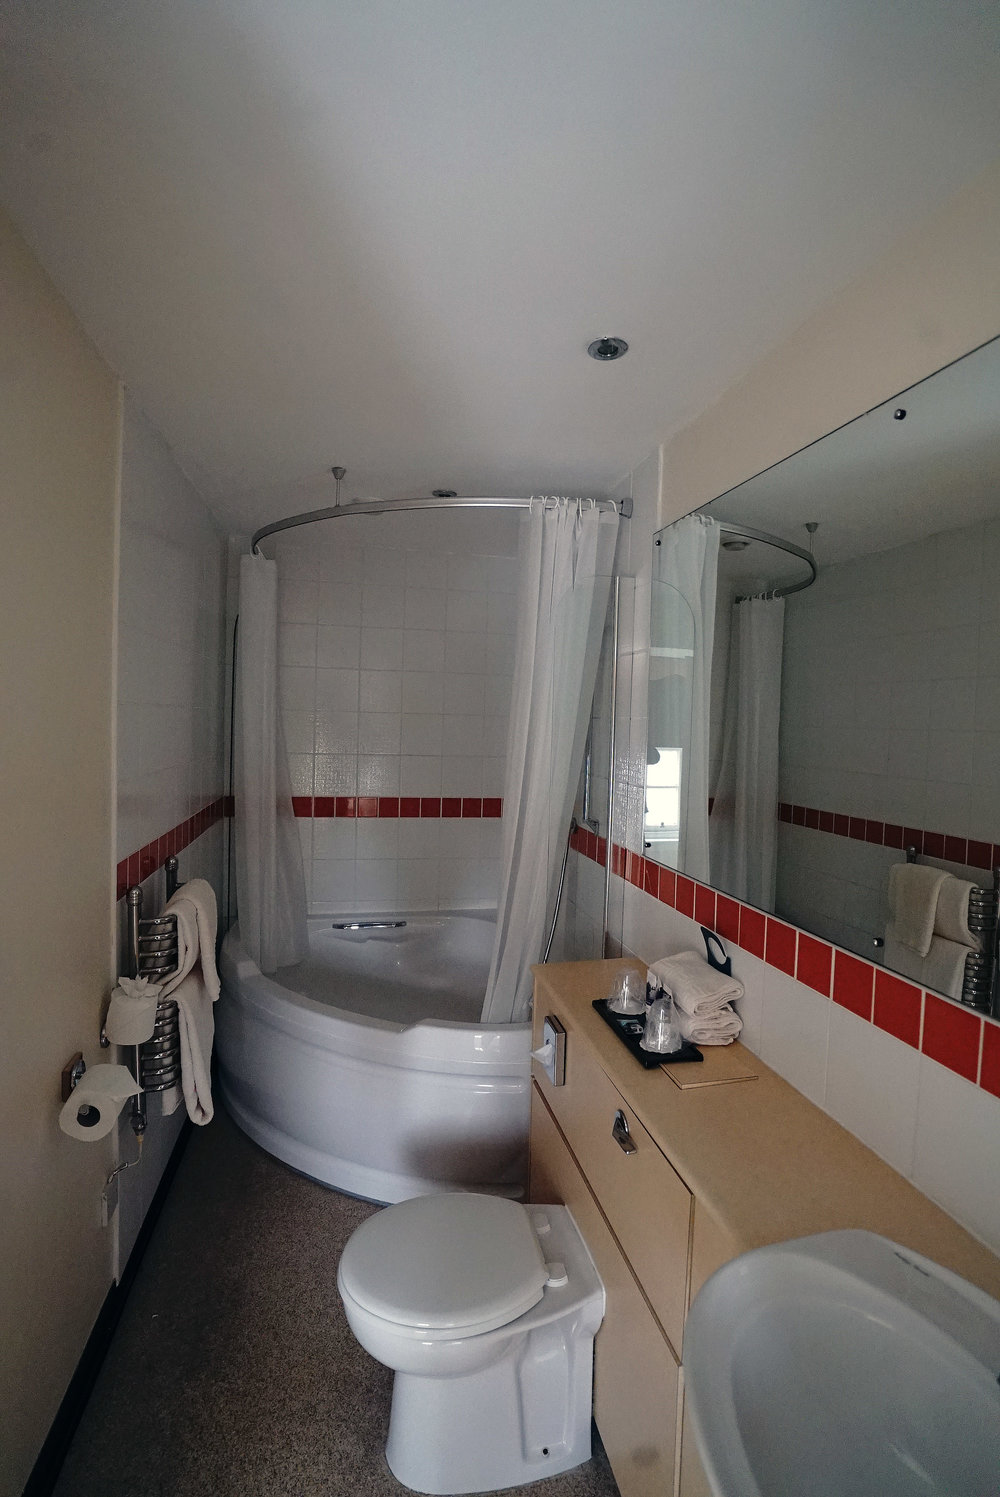 Mercure Peebles Bathroom.jpg